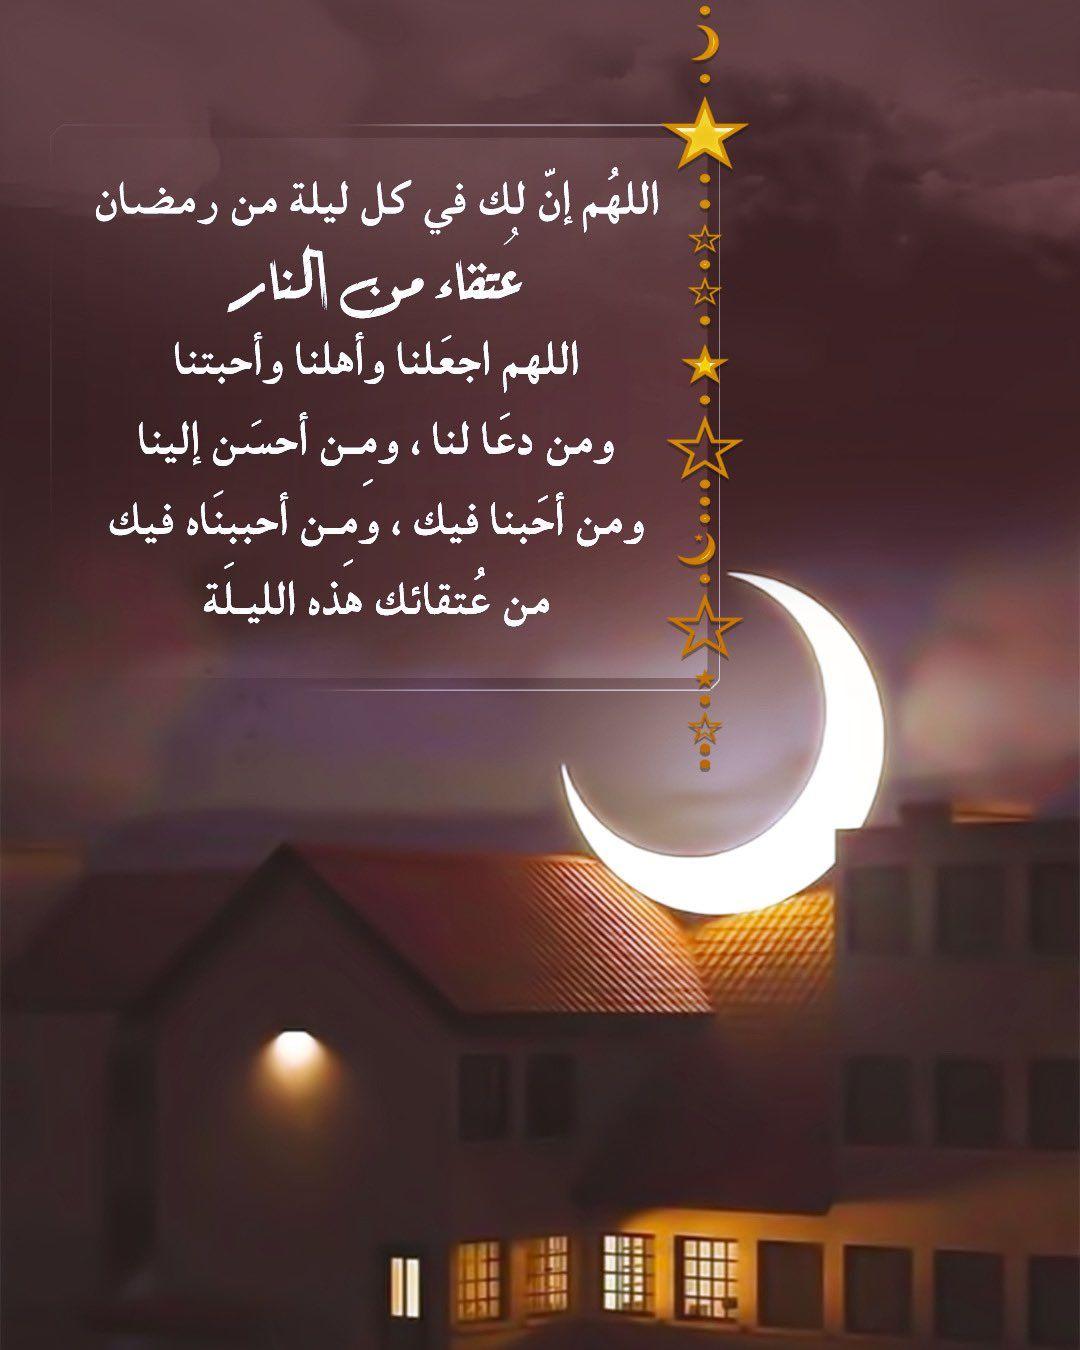 Pin By Zino On رمــــضــان Ramadan Day Ramadan Crafts Ramadan Decorations